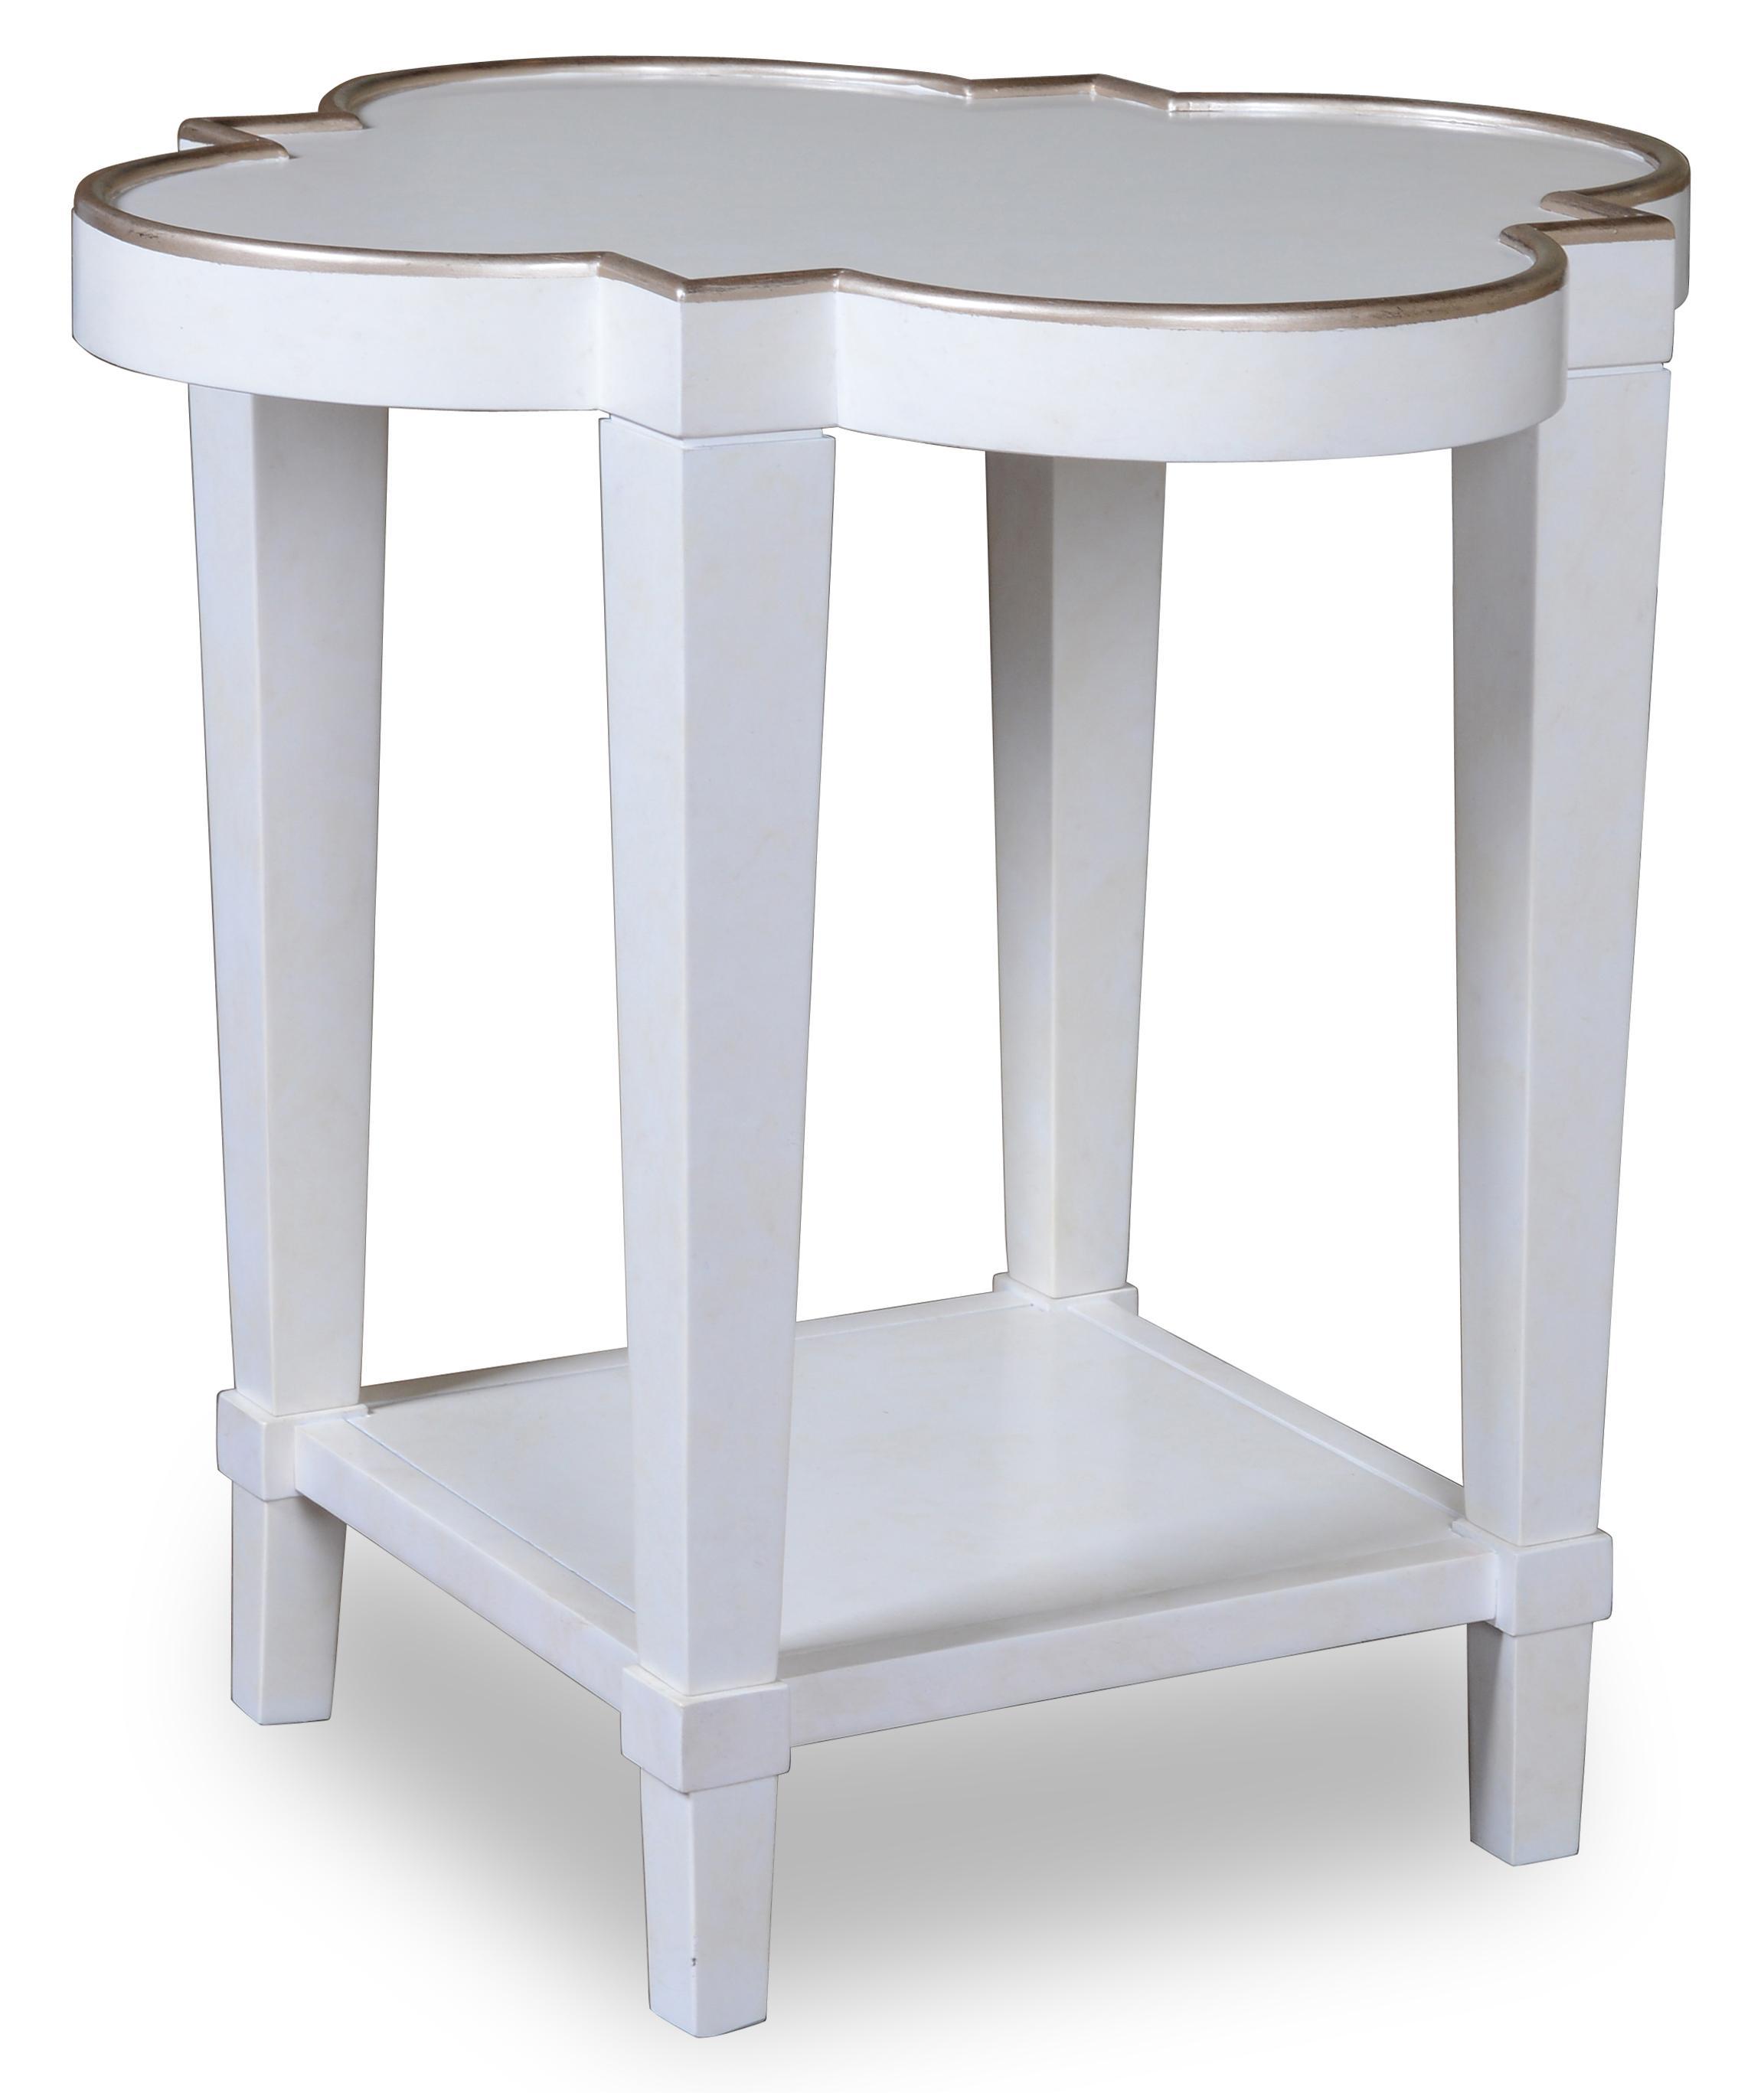 Belfort Signature Magellan Shaped End Table - Item Number: 208303-1817